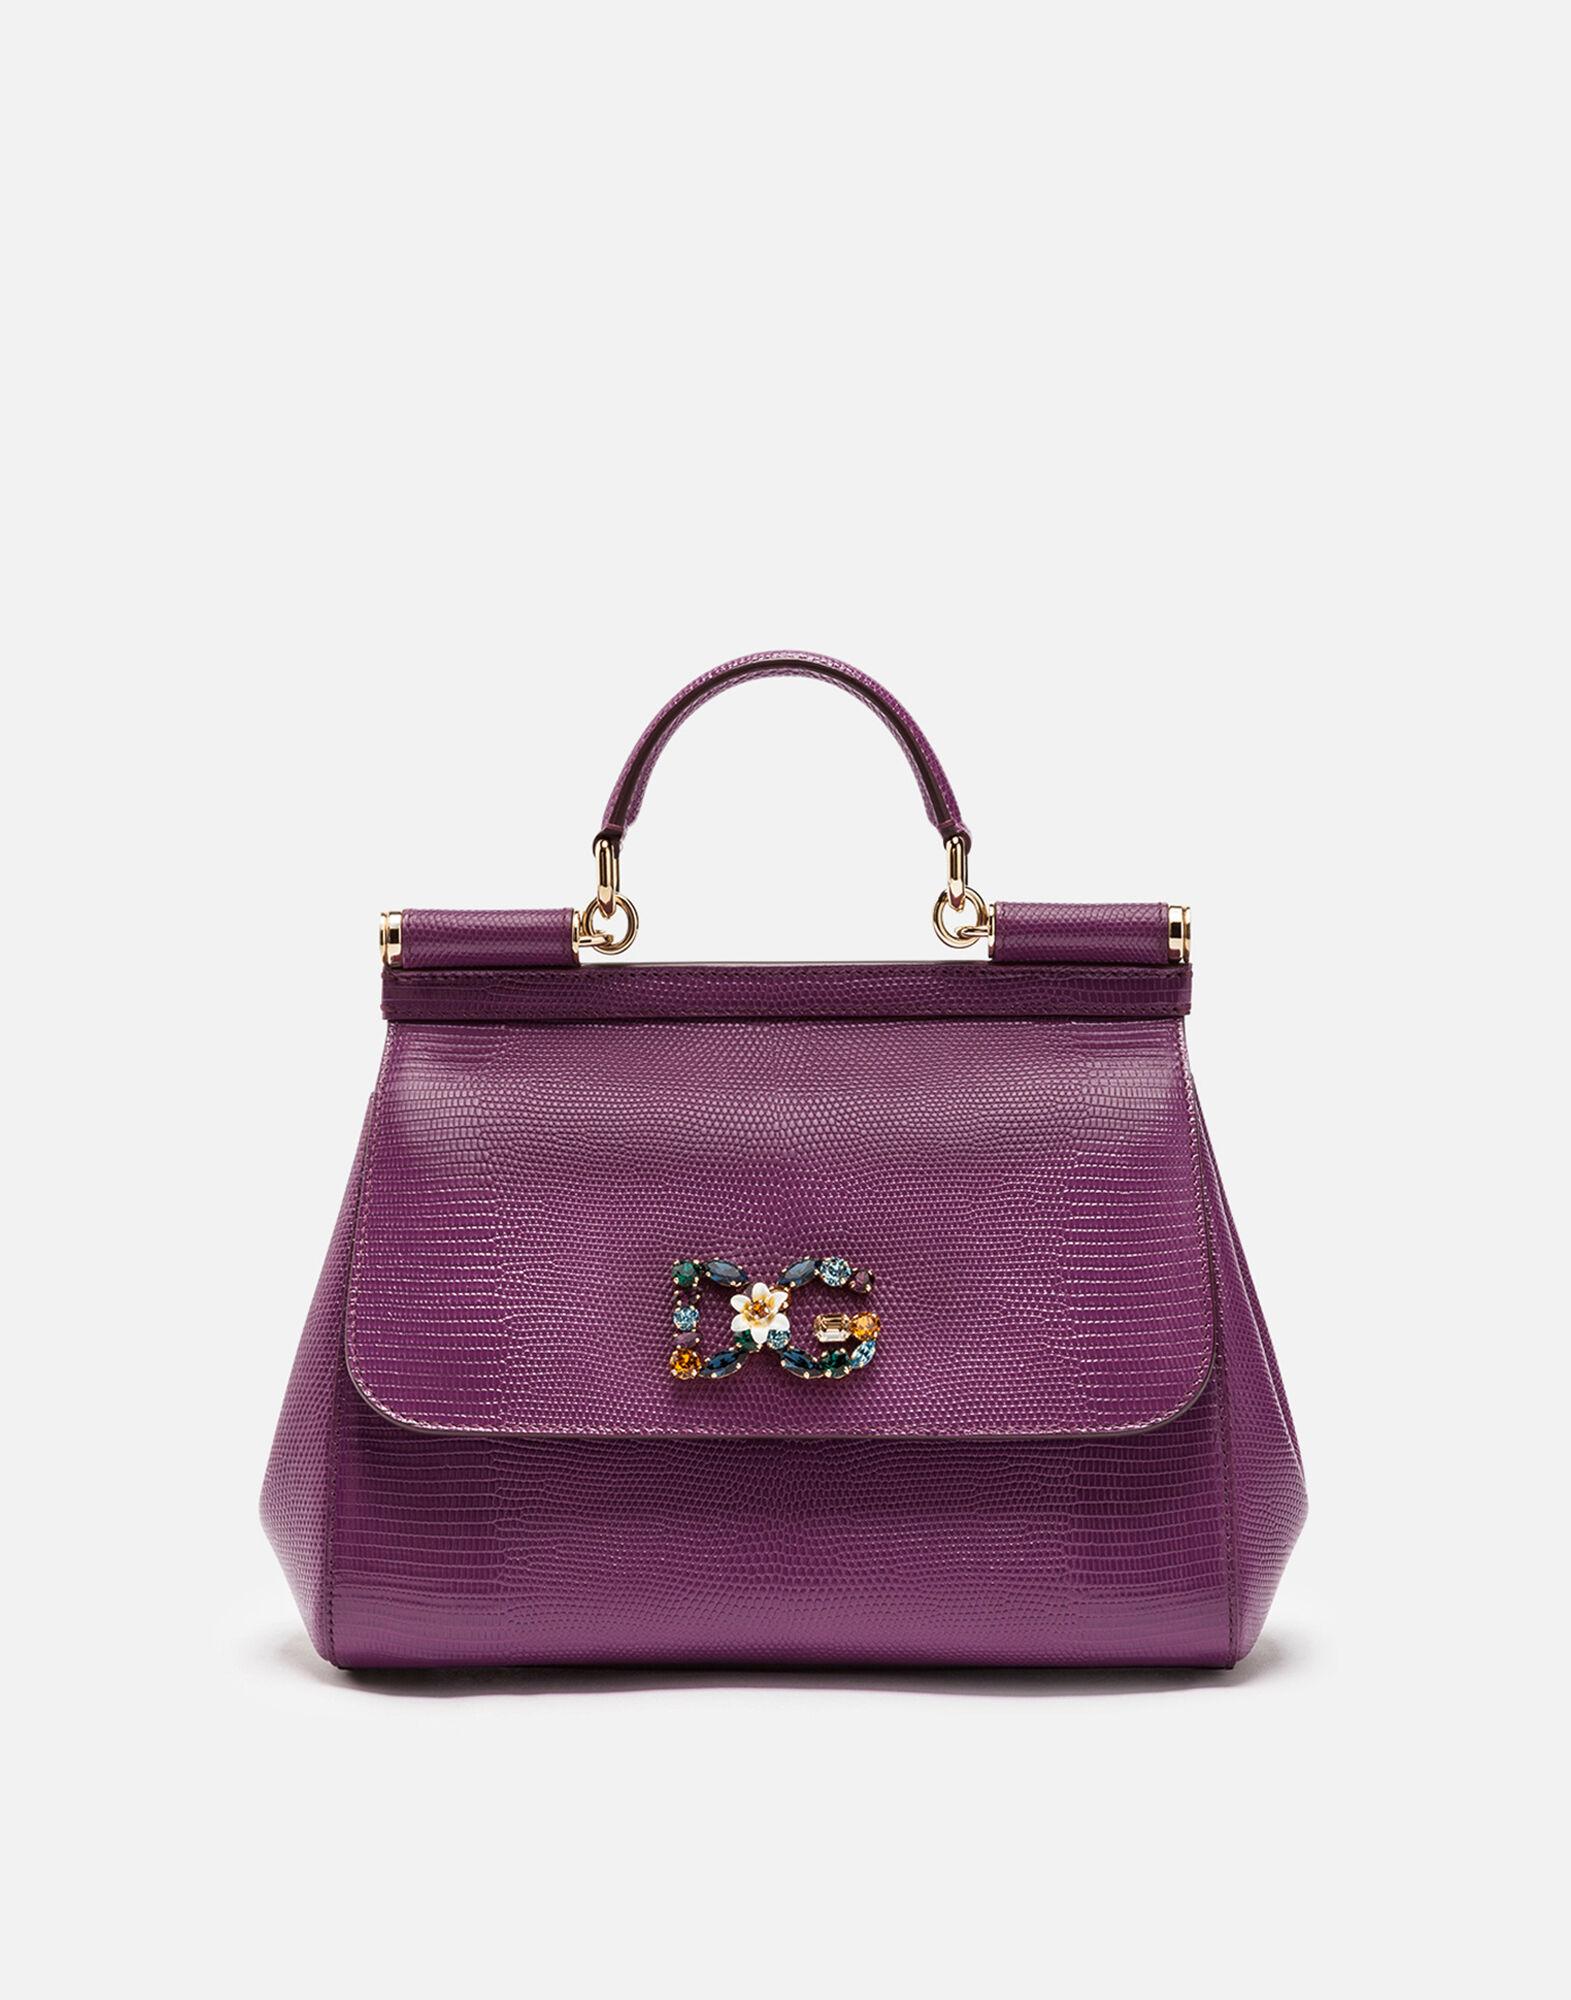 Top Handle Handbag On Sale, Royal Blue, Leather, 2017, one size Dolce & Gabbana